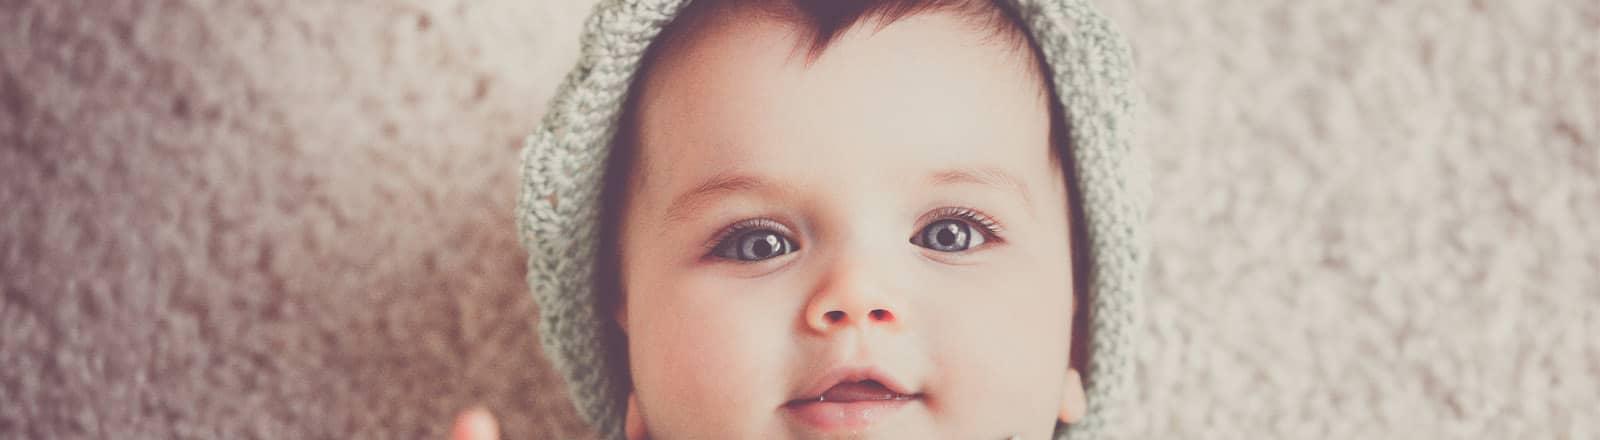 torticolis congenita fisioterapia del bebe